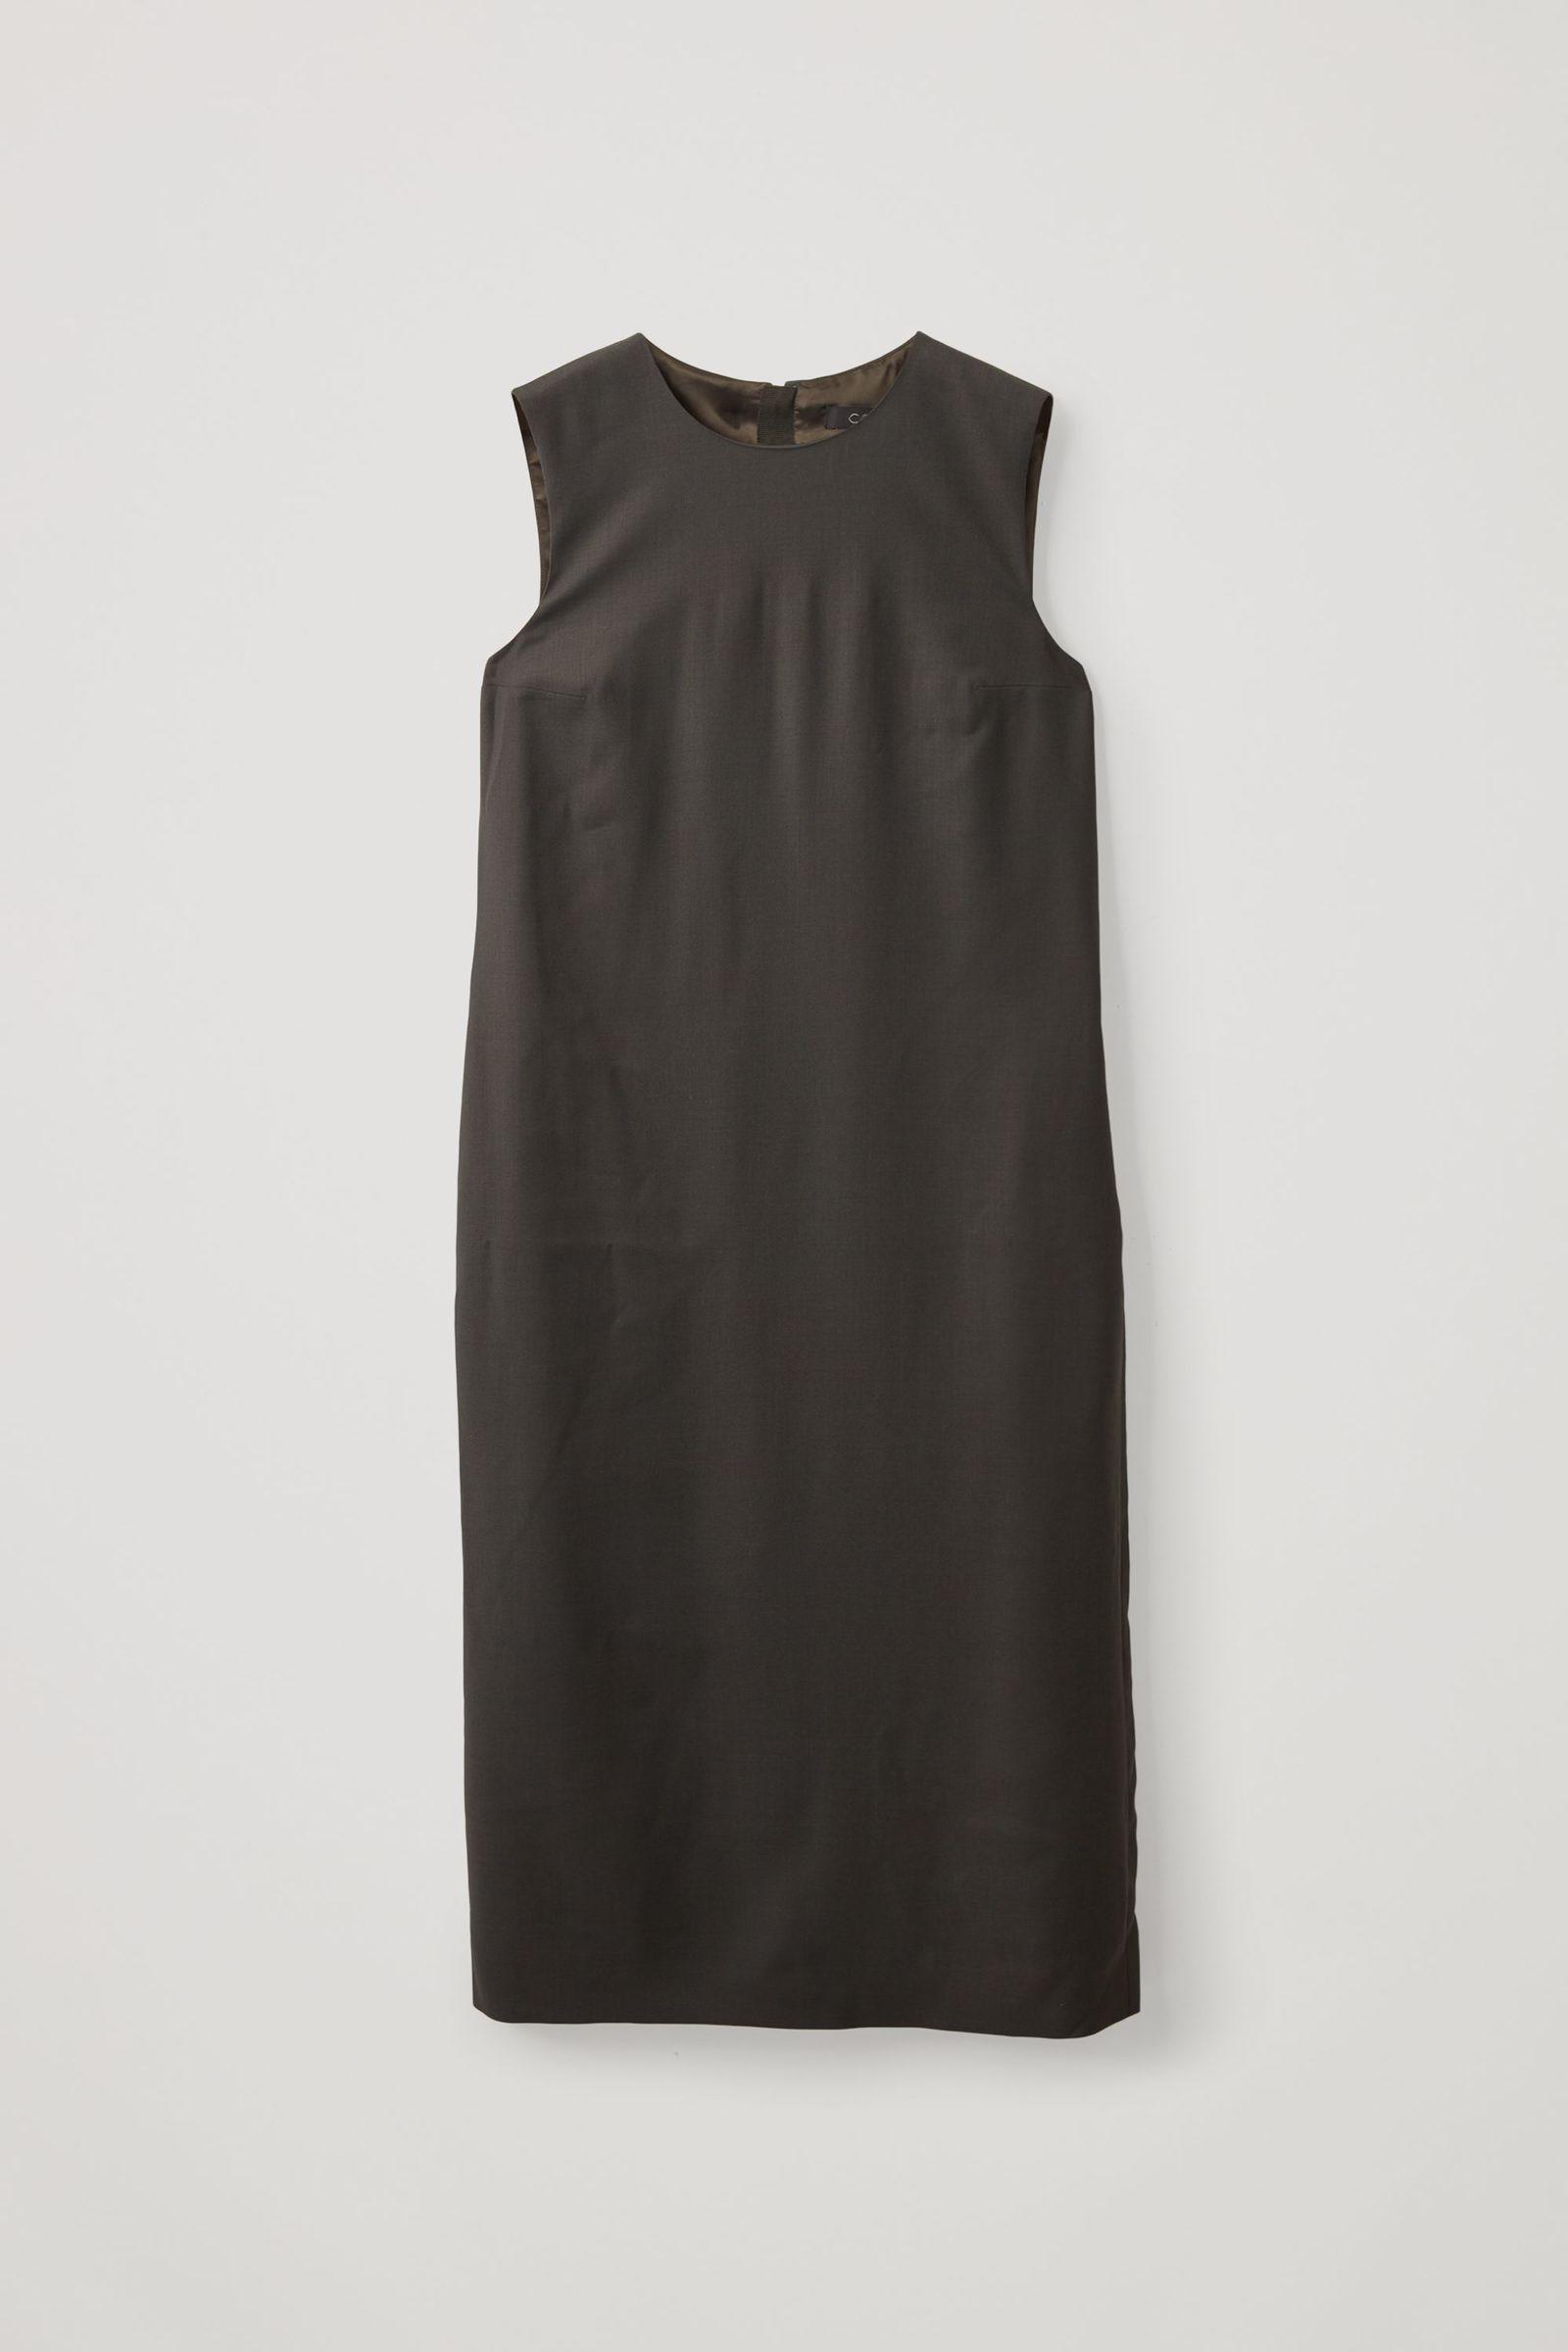 COS 울 믹스 테일러드 드레스의 다크 그레이컬러 Product입니다.